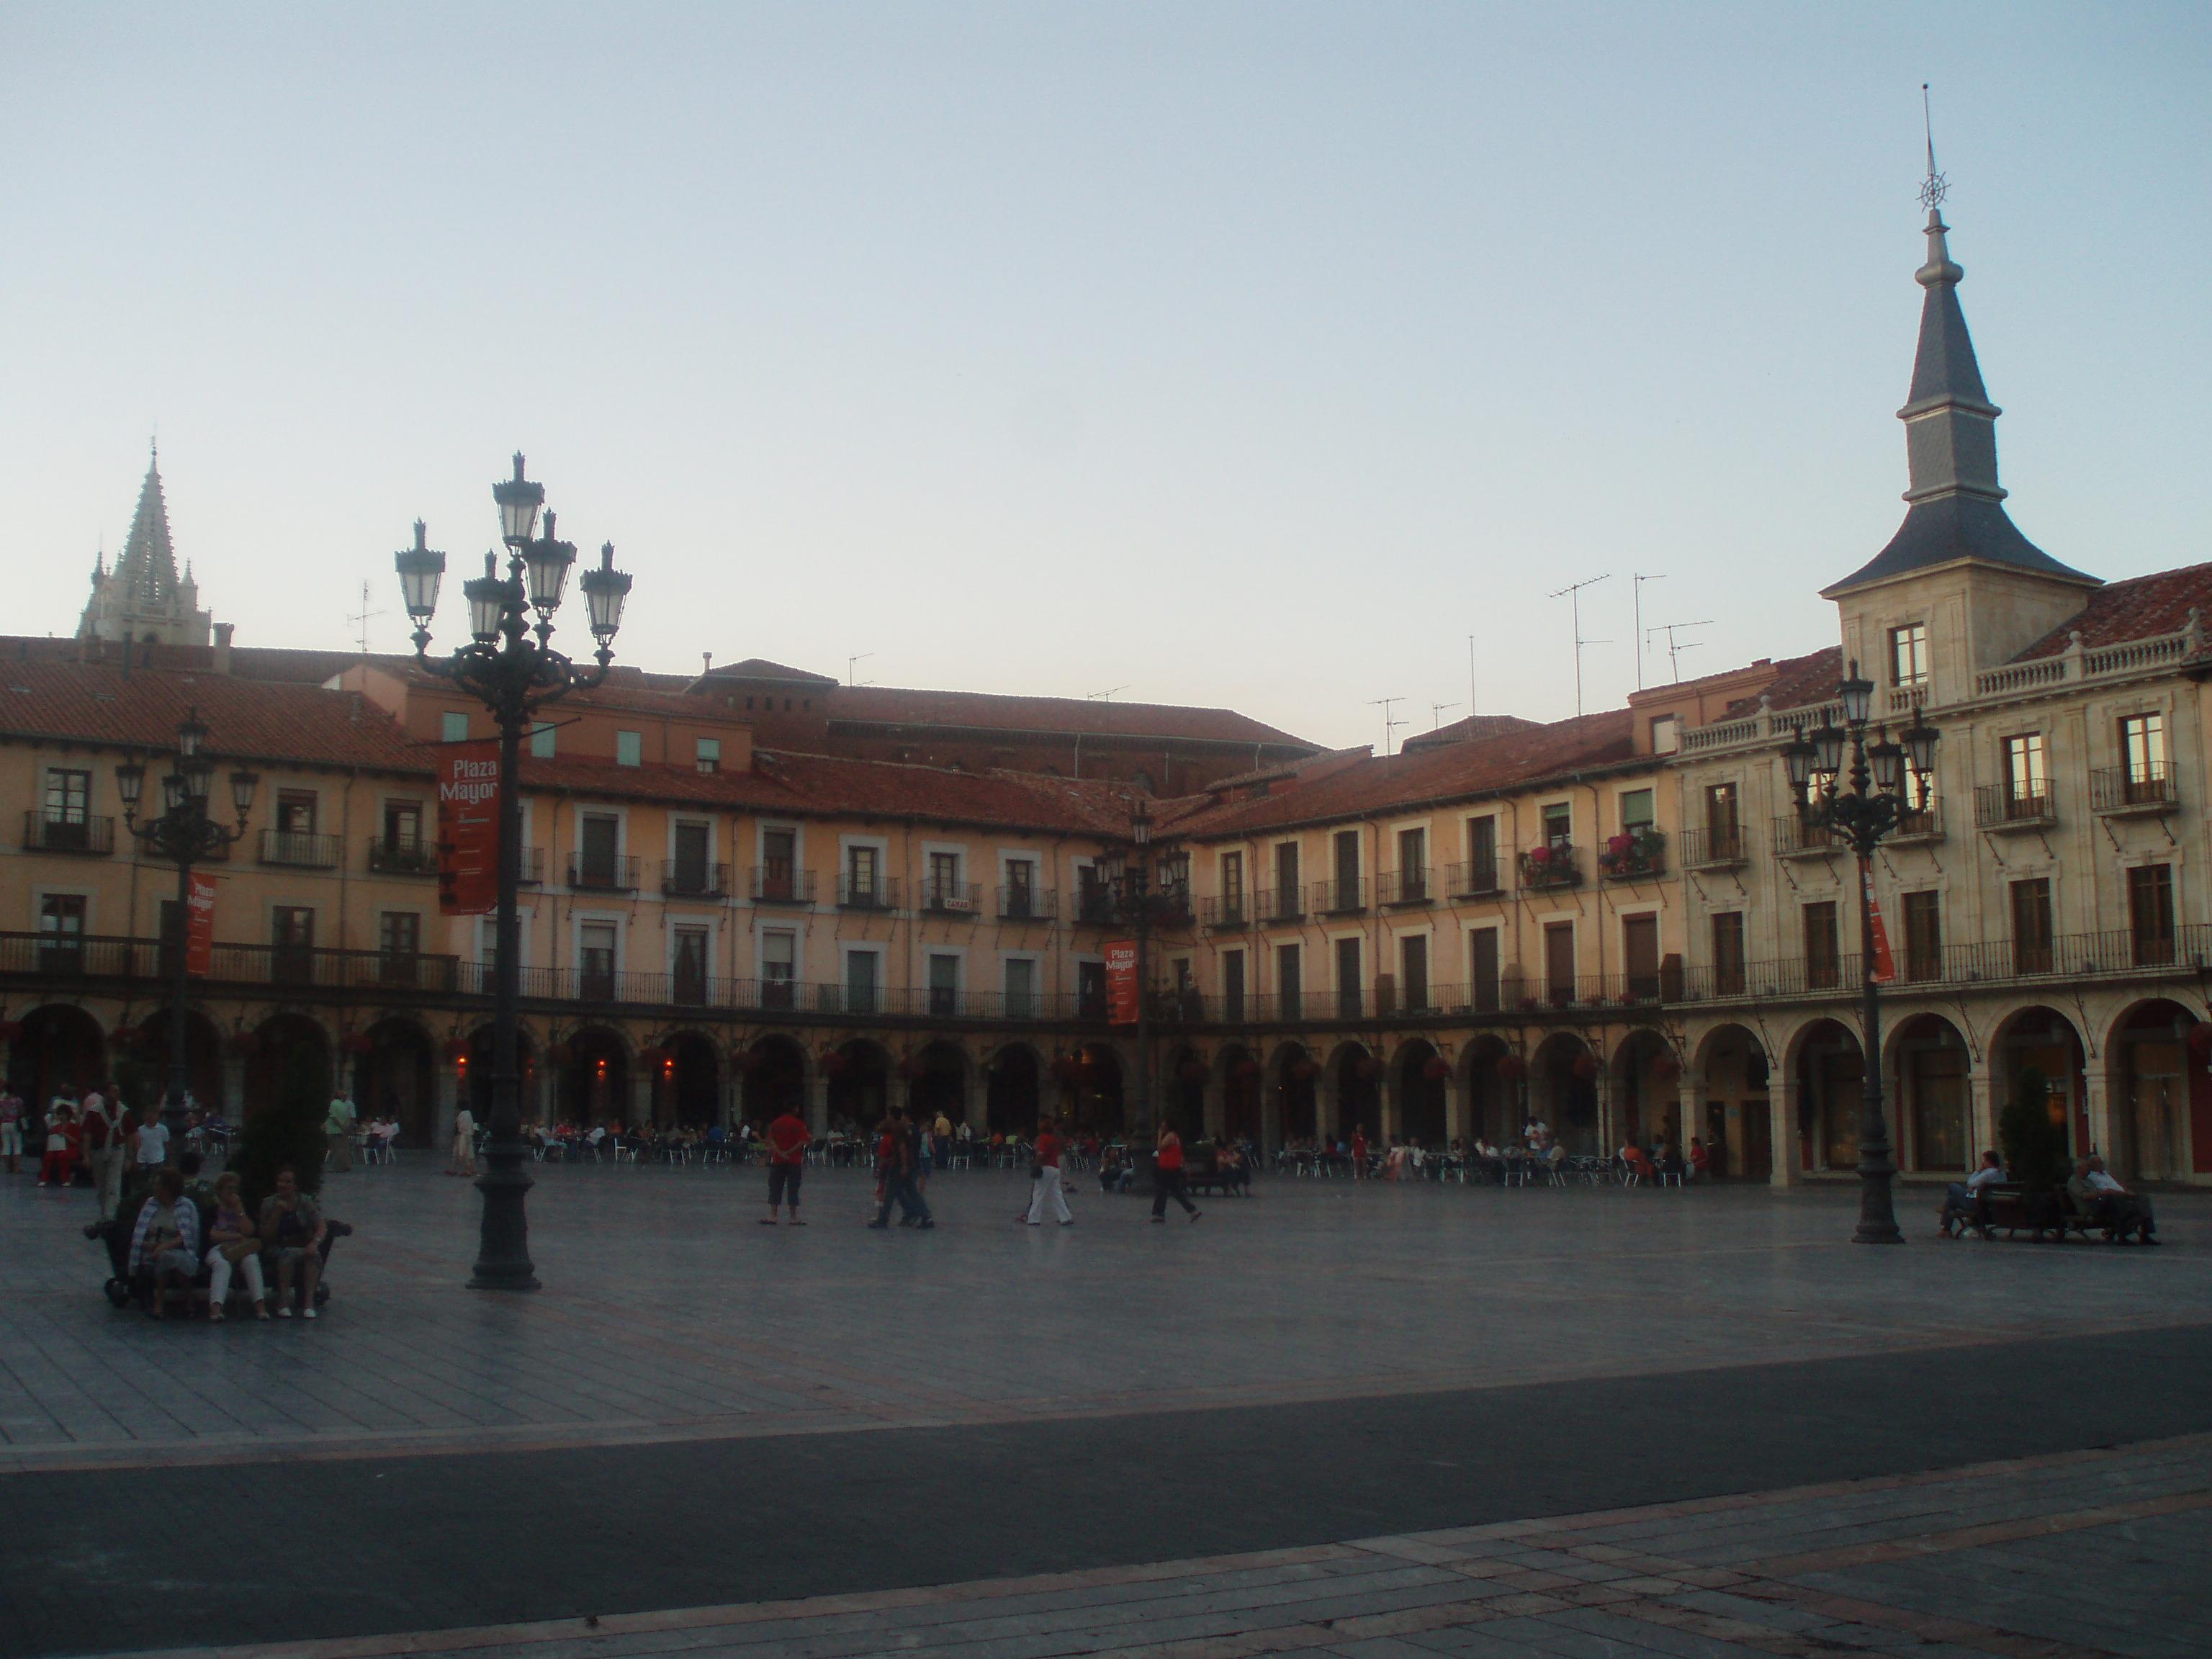 File:Panorámica de la Plaza Mayor de León (España).JPG - Wikimedia Commons